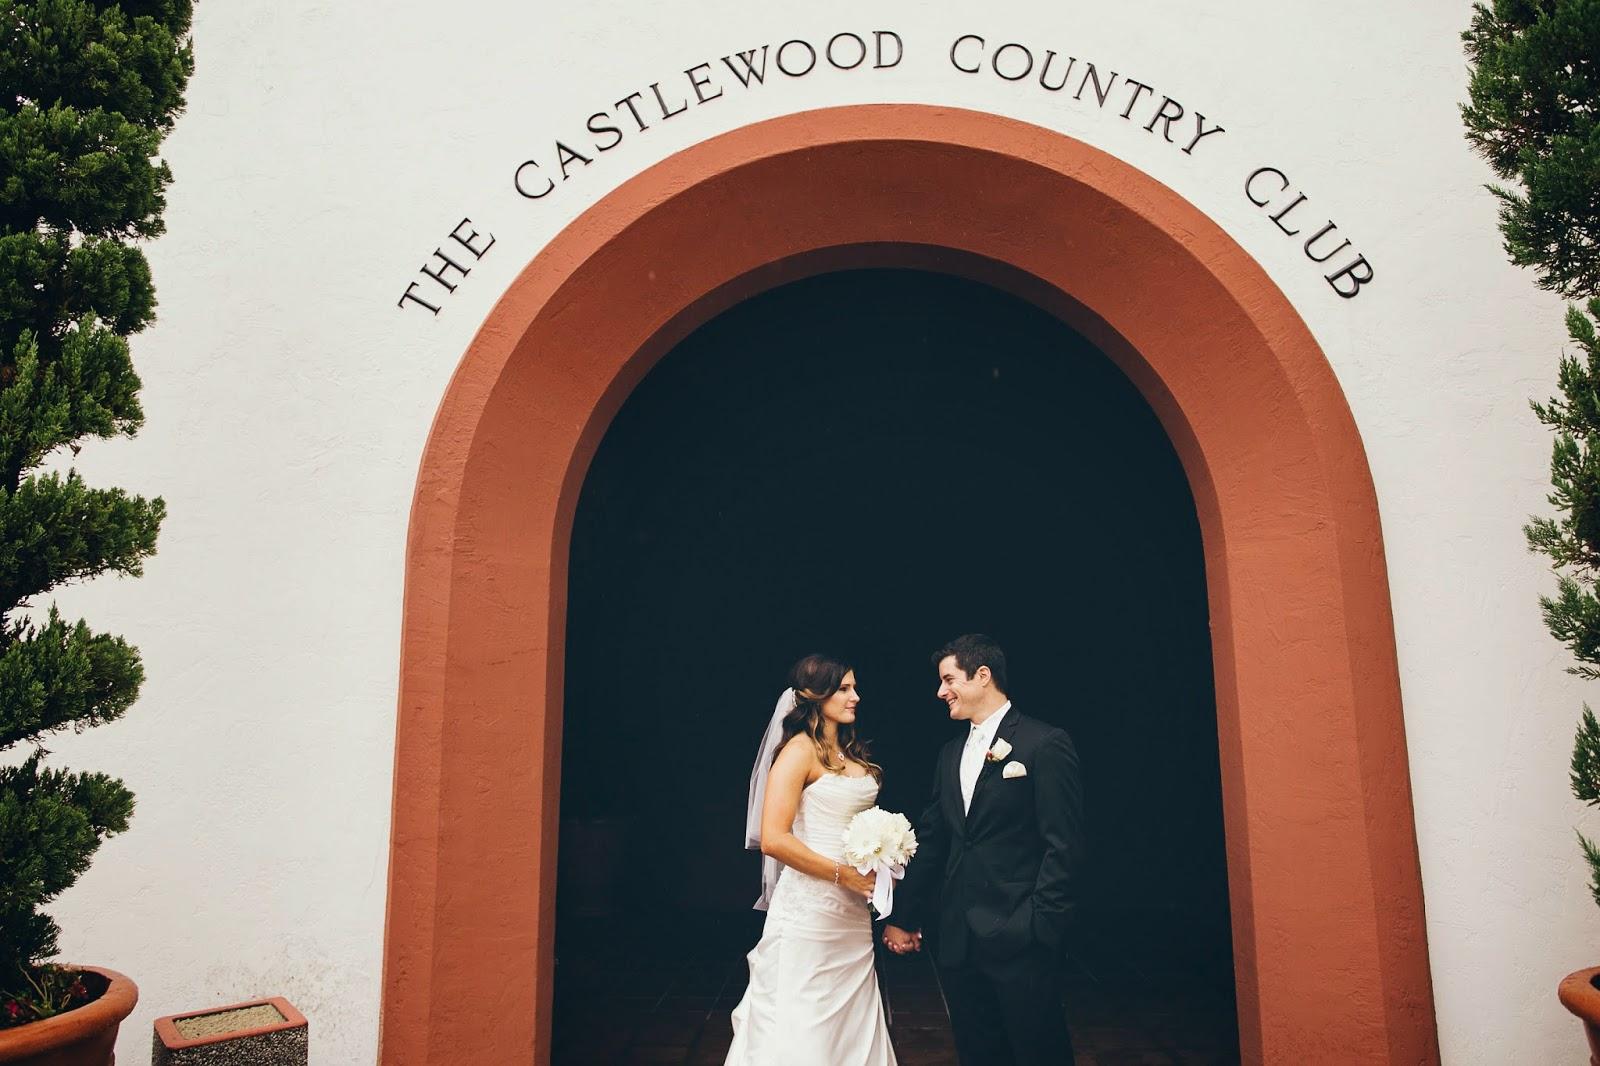 Castlewood Country Club Pleasanton Ca Best Outdoor: Bridal Makeup Artist: Gorgeous Wedding At